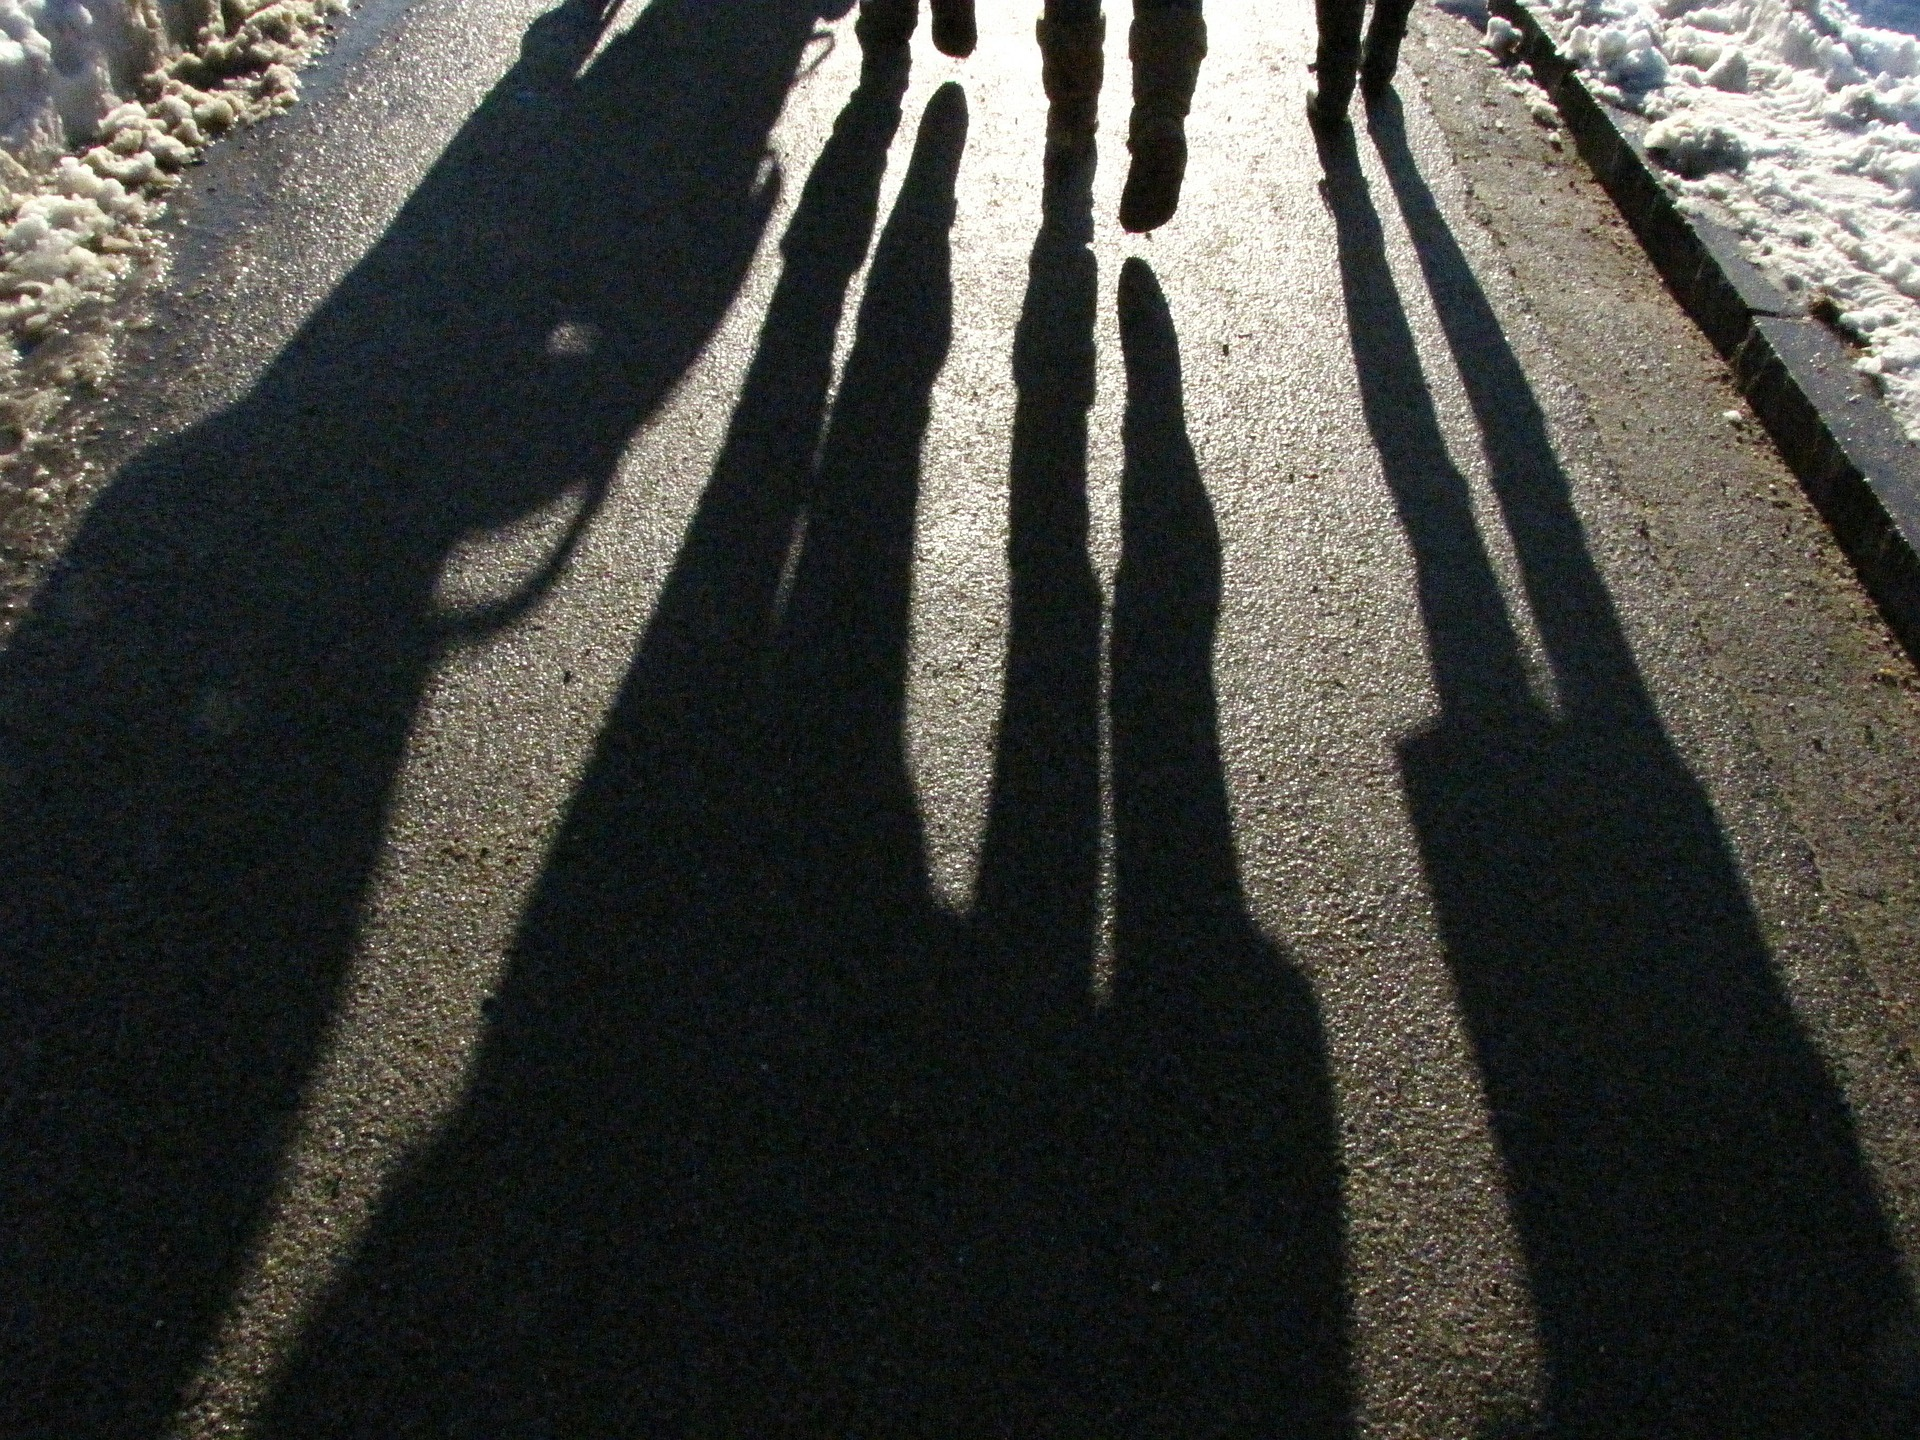 shadows-183121_1920